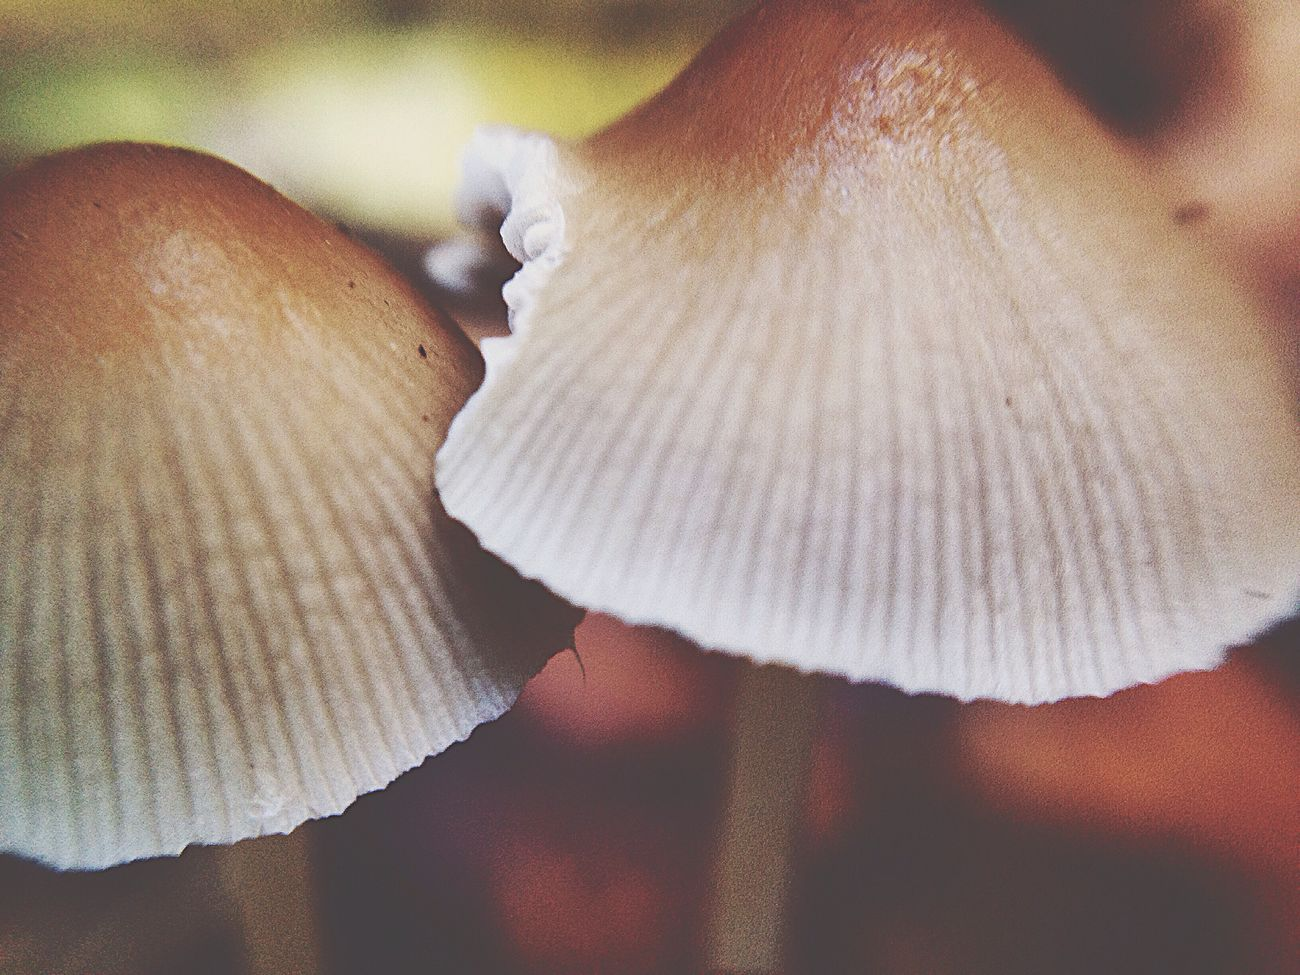 Champignon Maximum Closeness Nature Beauty In Nature